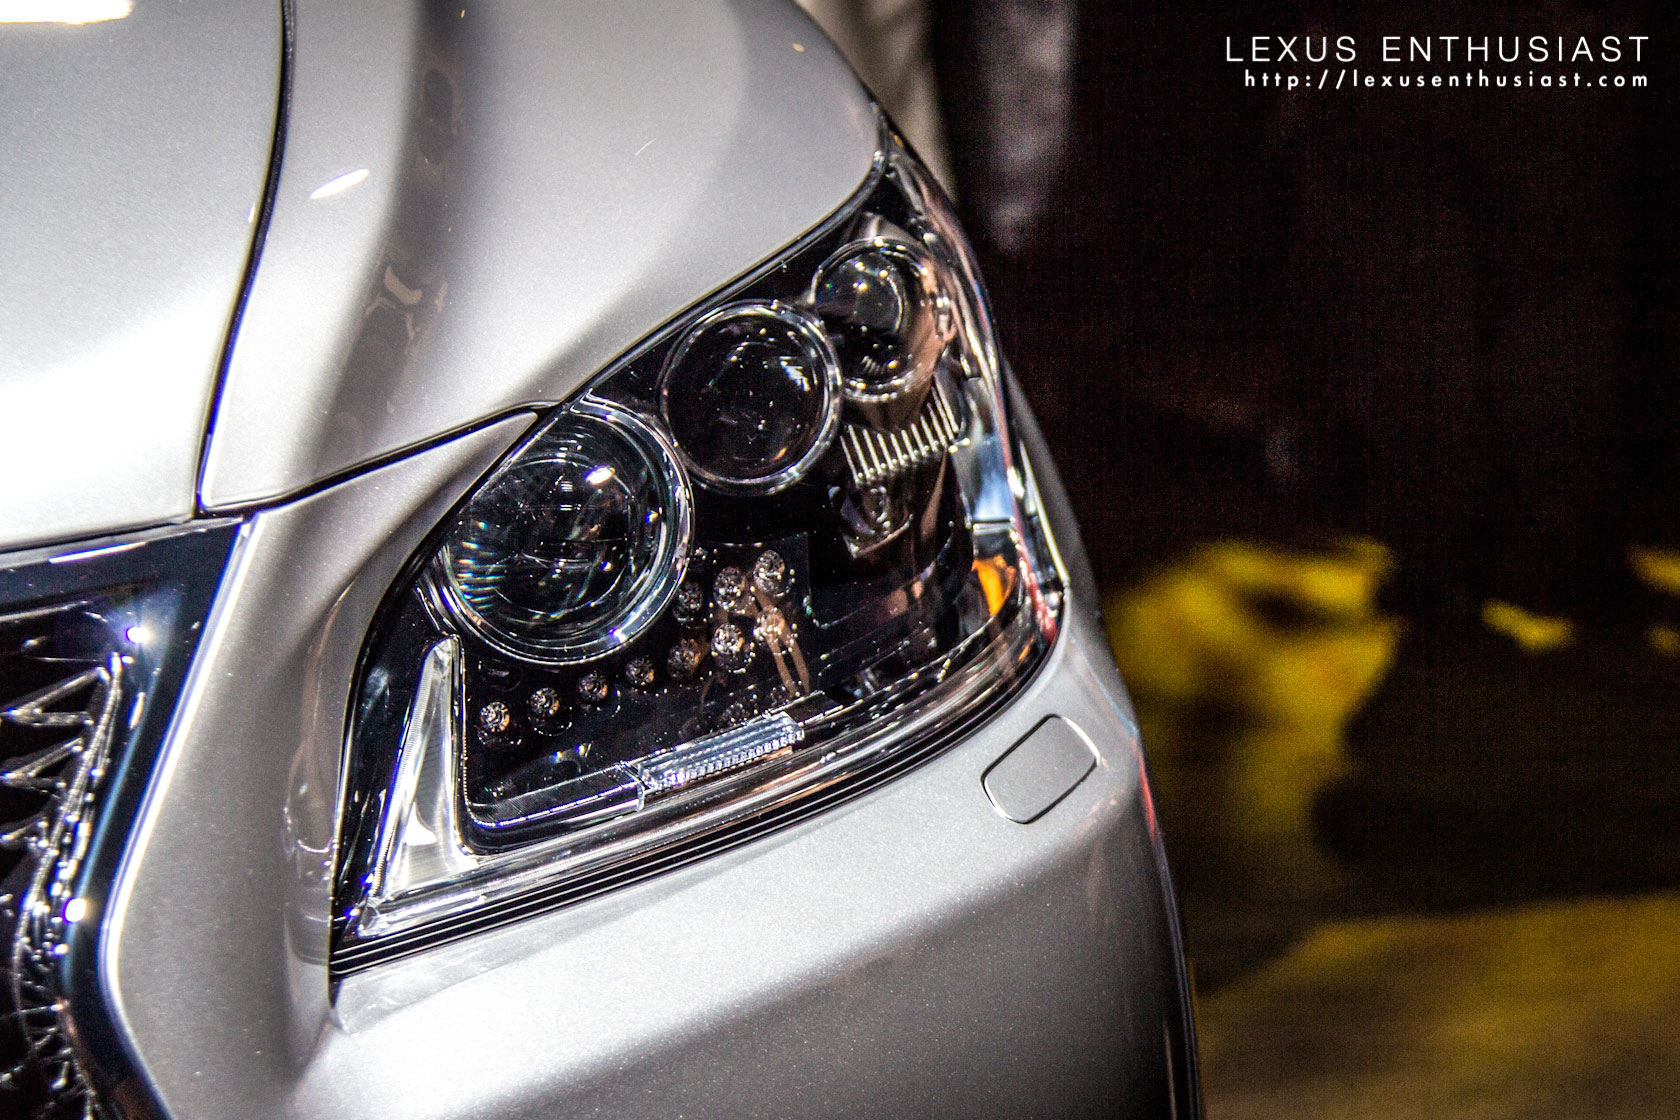 2011 lexus rx 450h owners manual